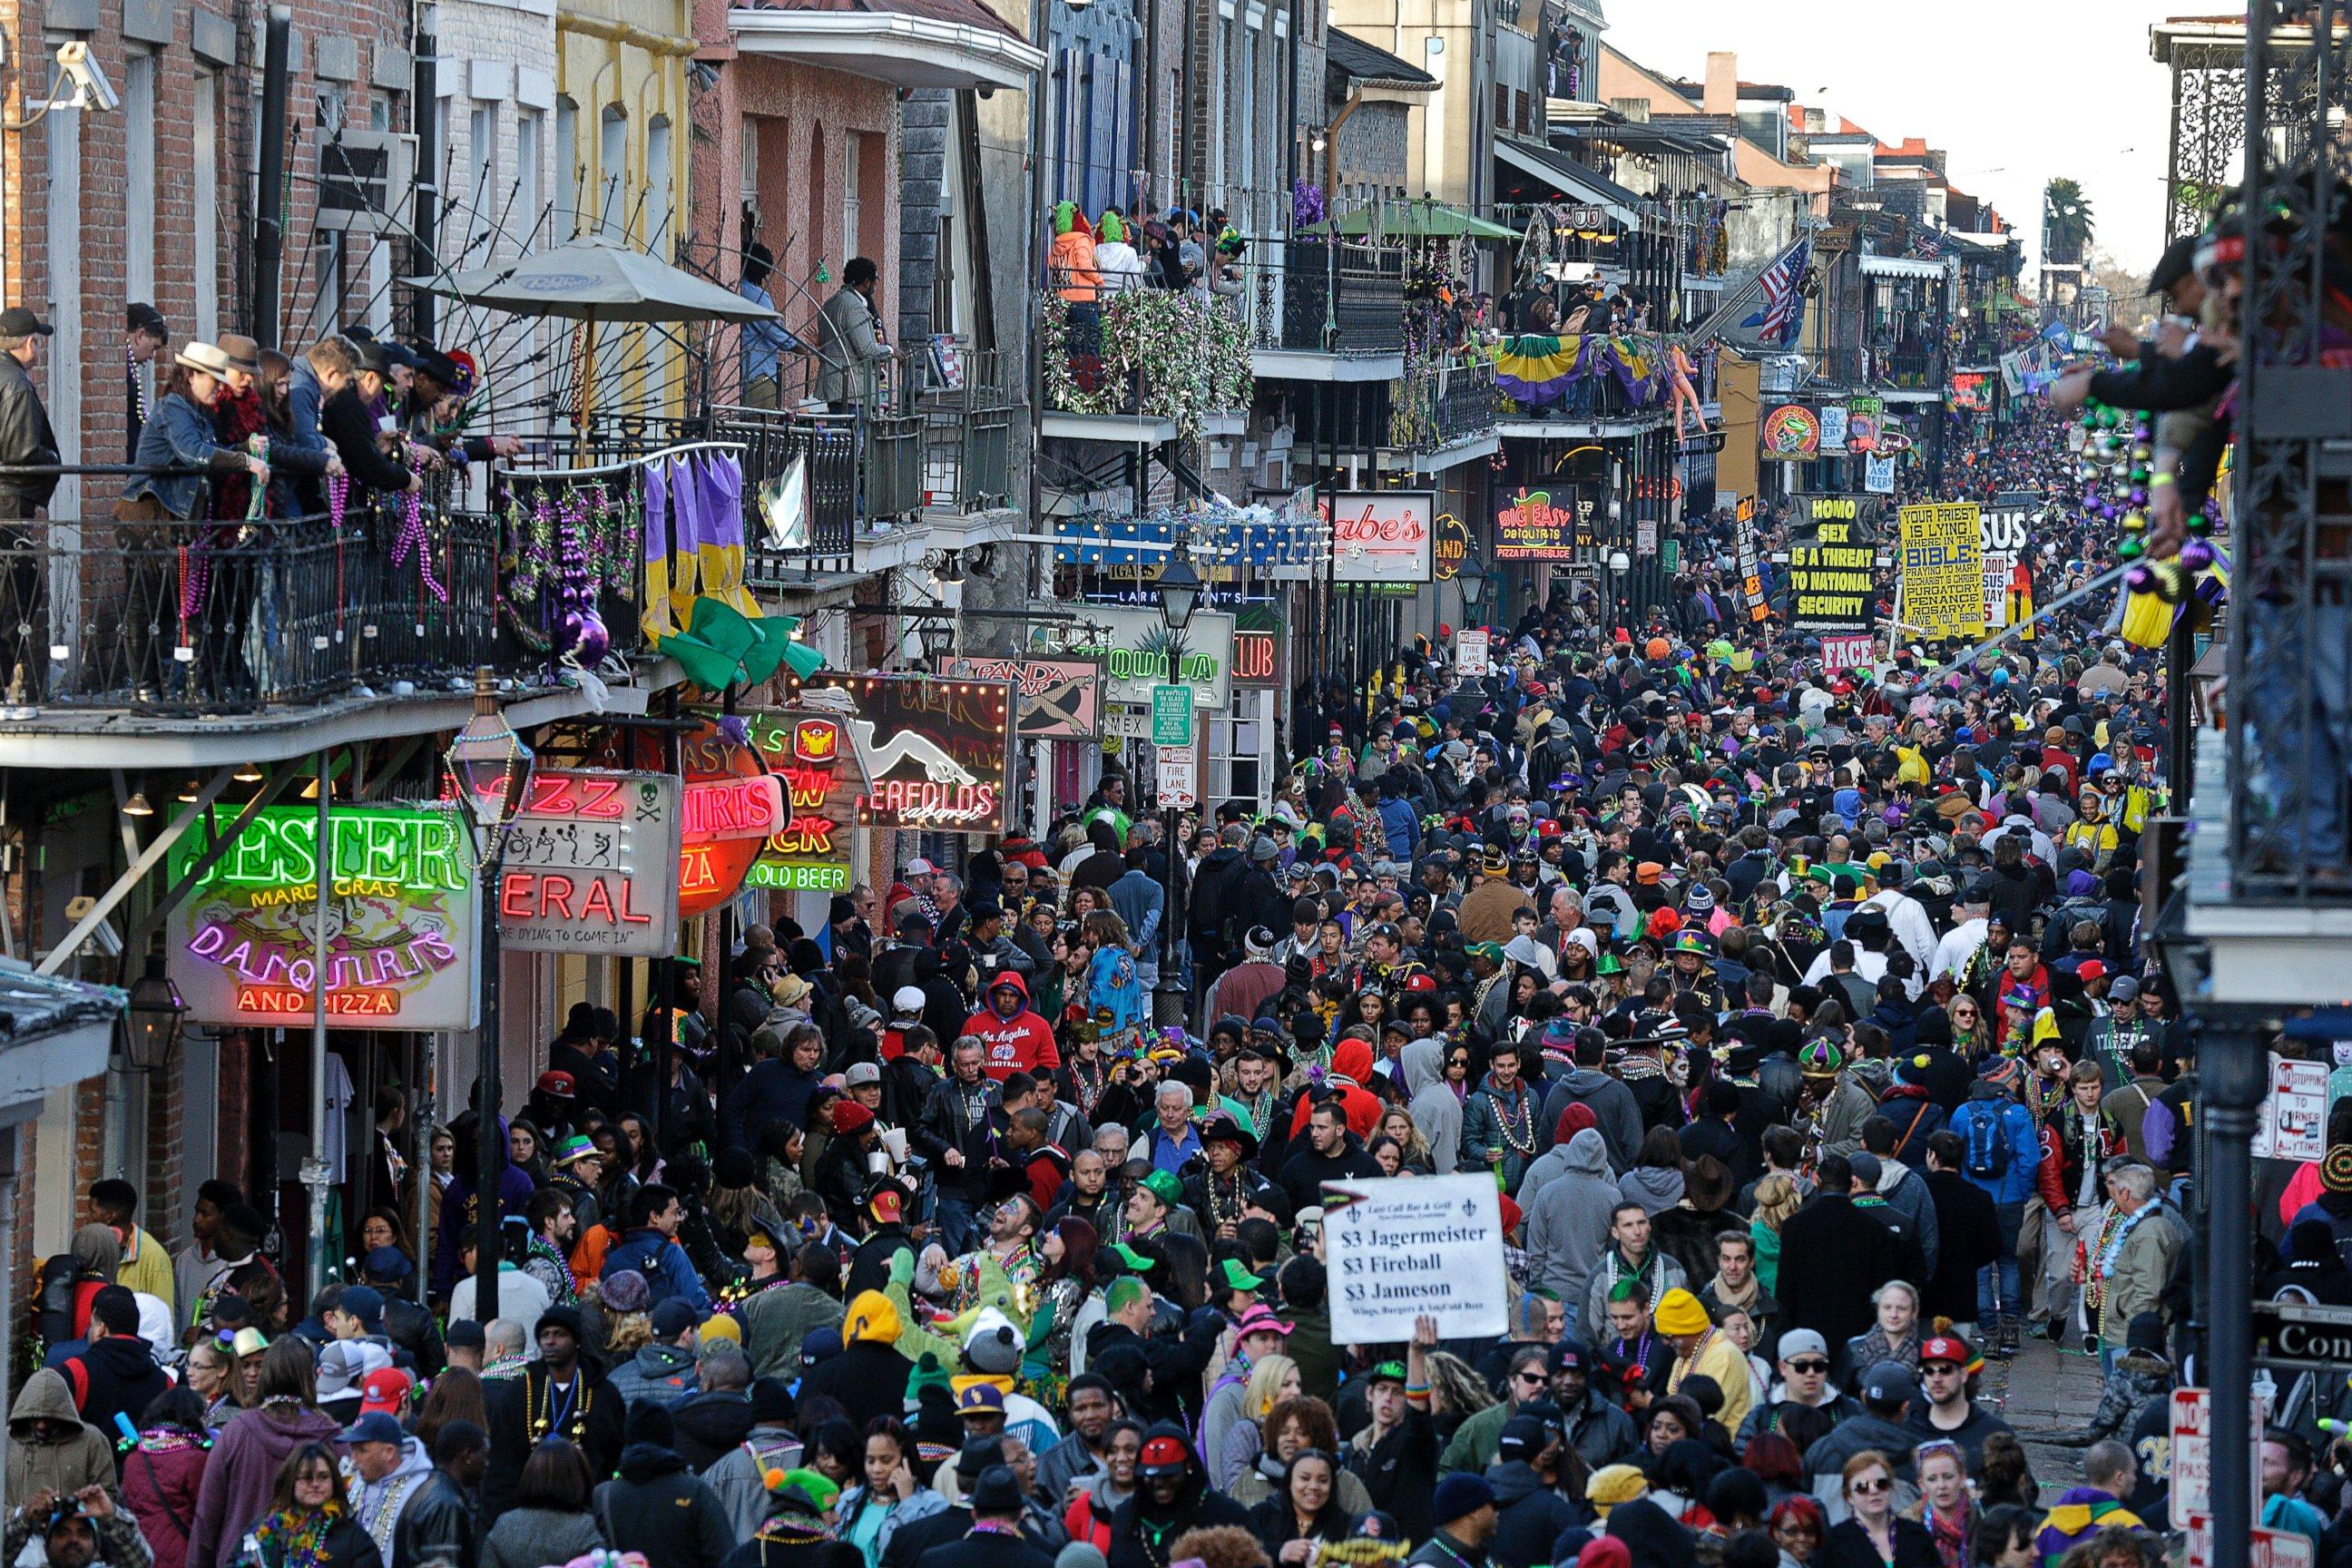 Revelers pack Bourbon Street beneath the balcony of the Royal Sonesta